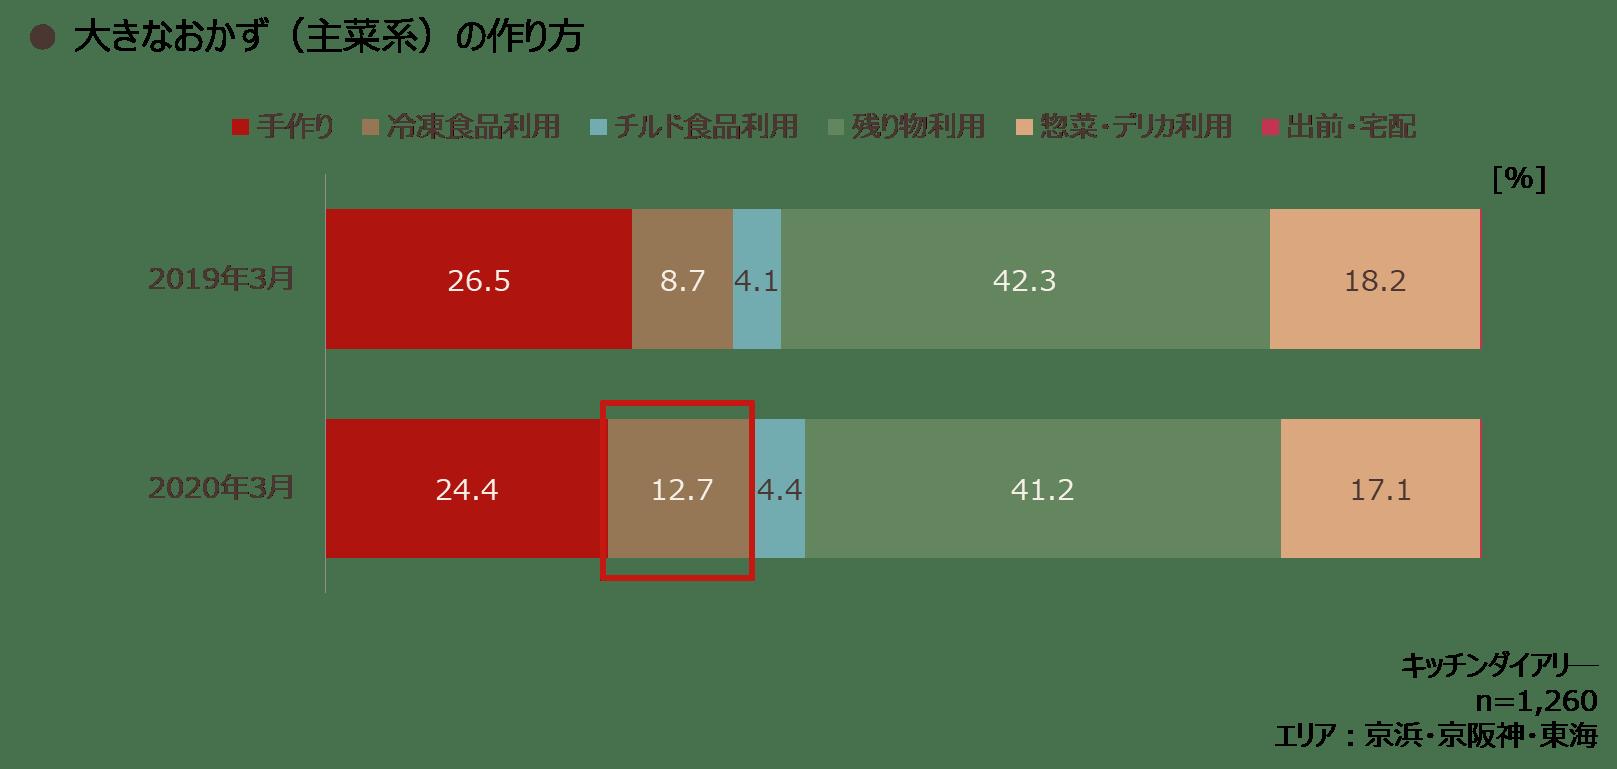 sugomori_8.png